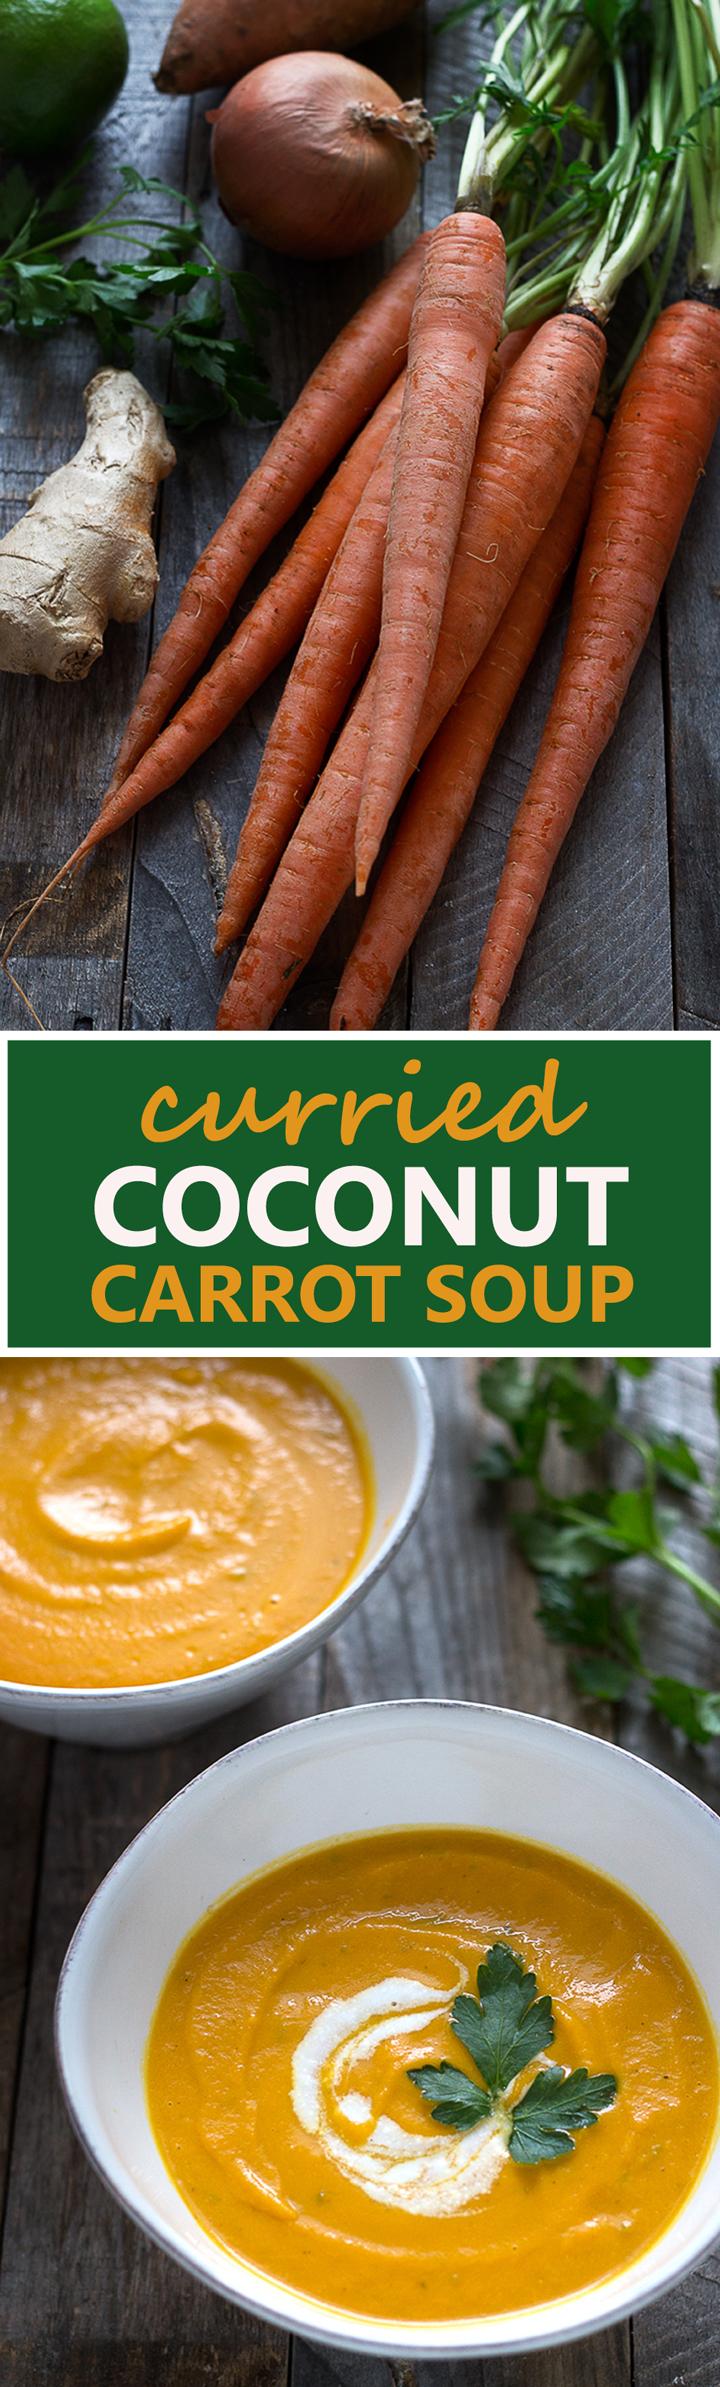 Vegan Curried Coconut-Carrot Soup| cookingatsabrinas.com @sabrinascooking